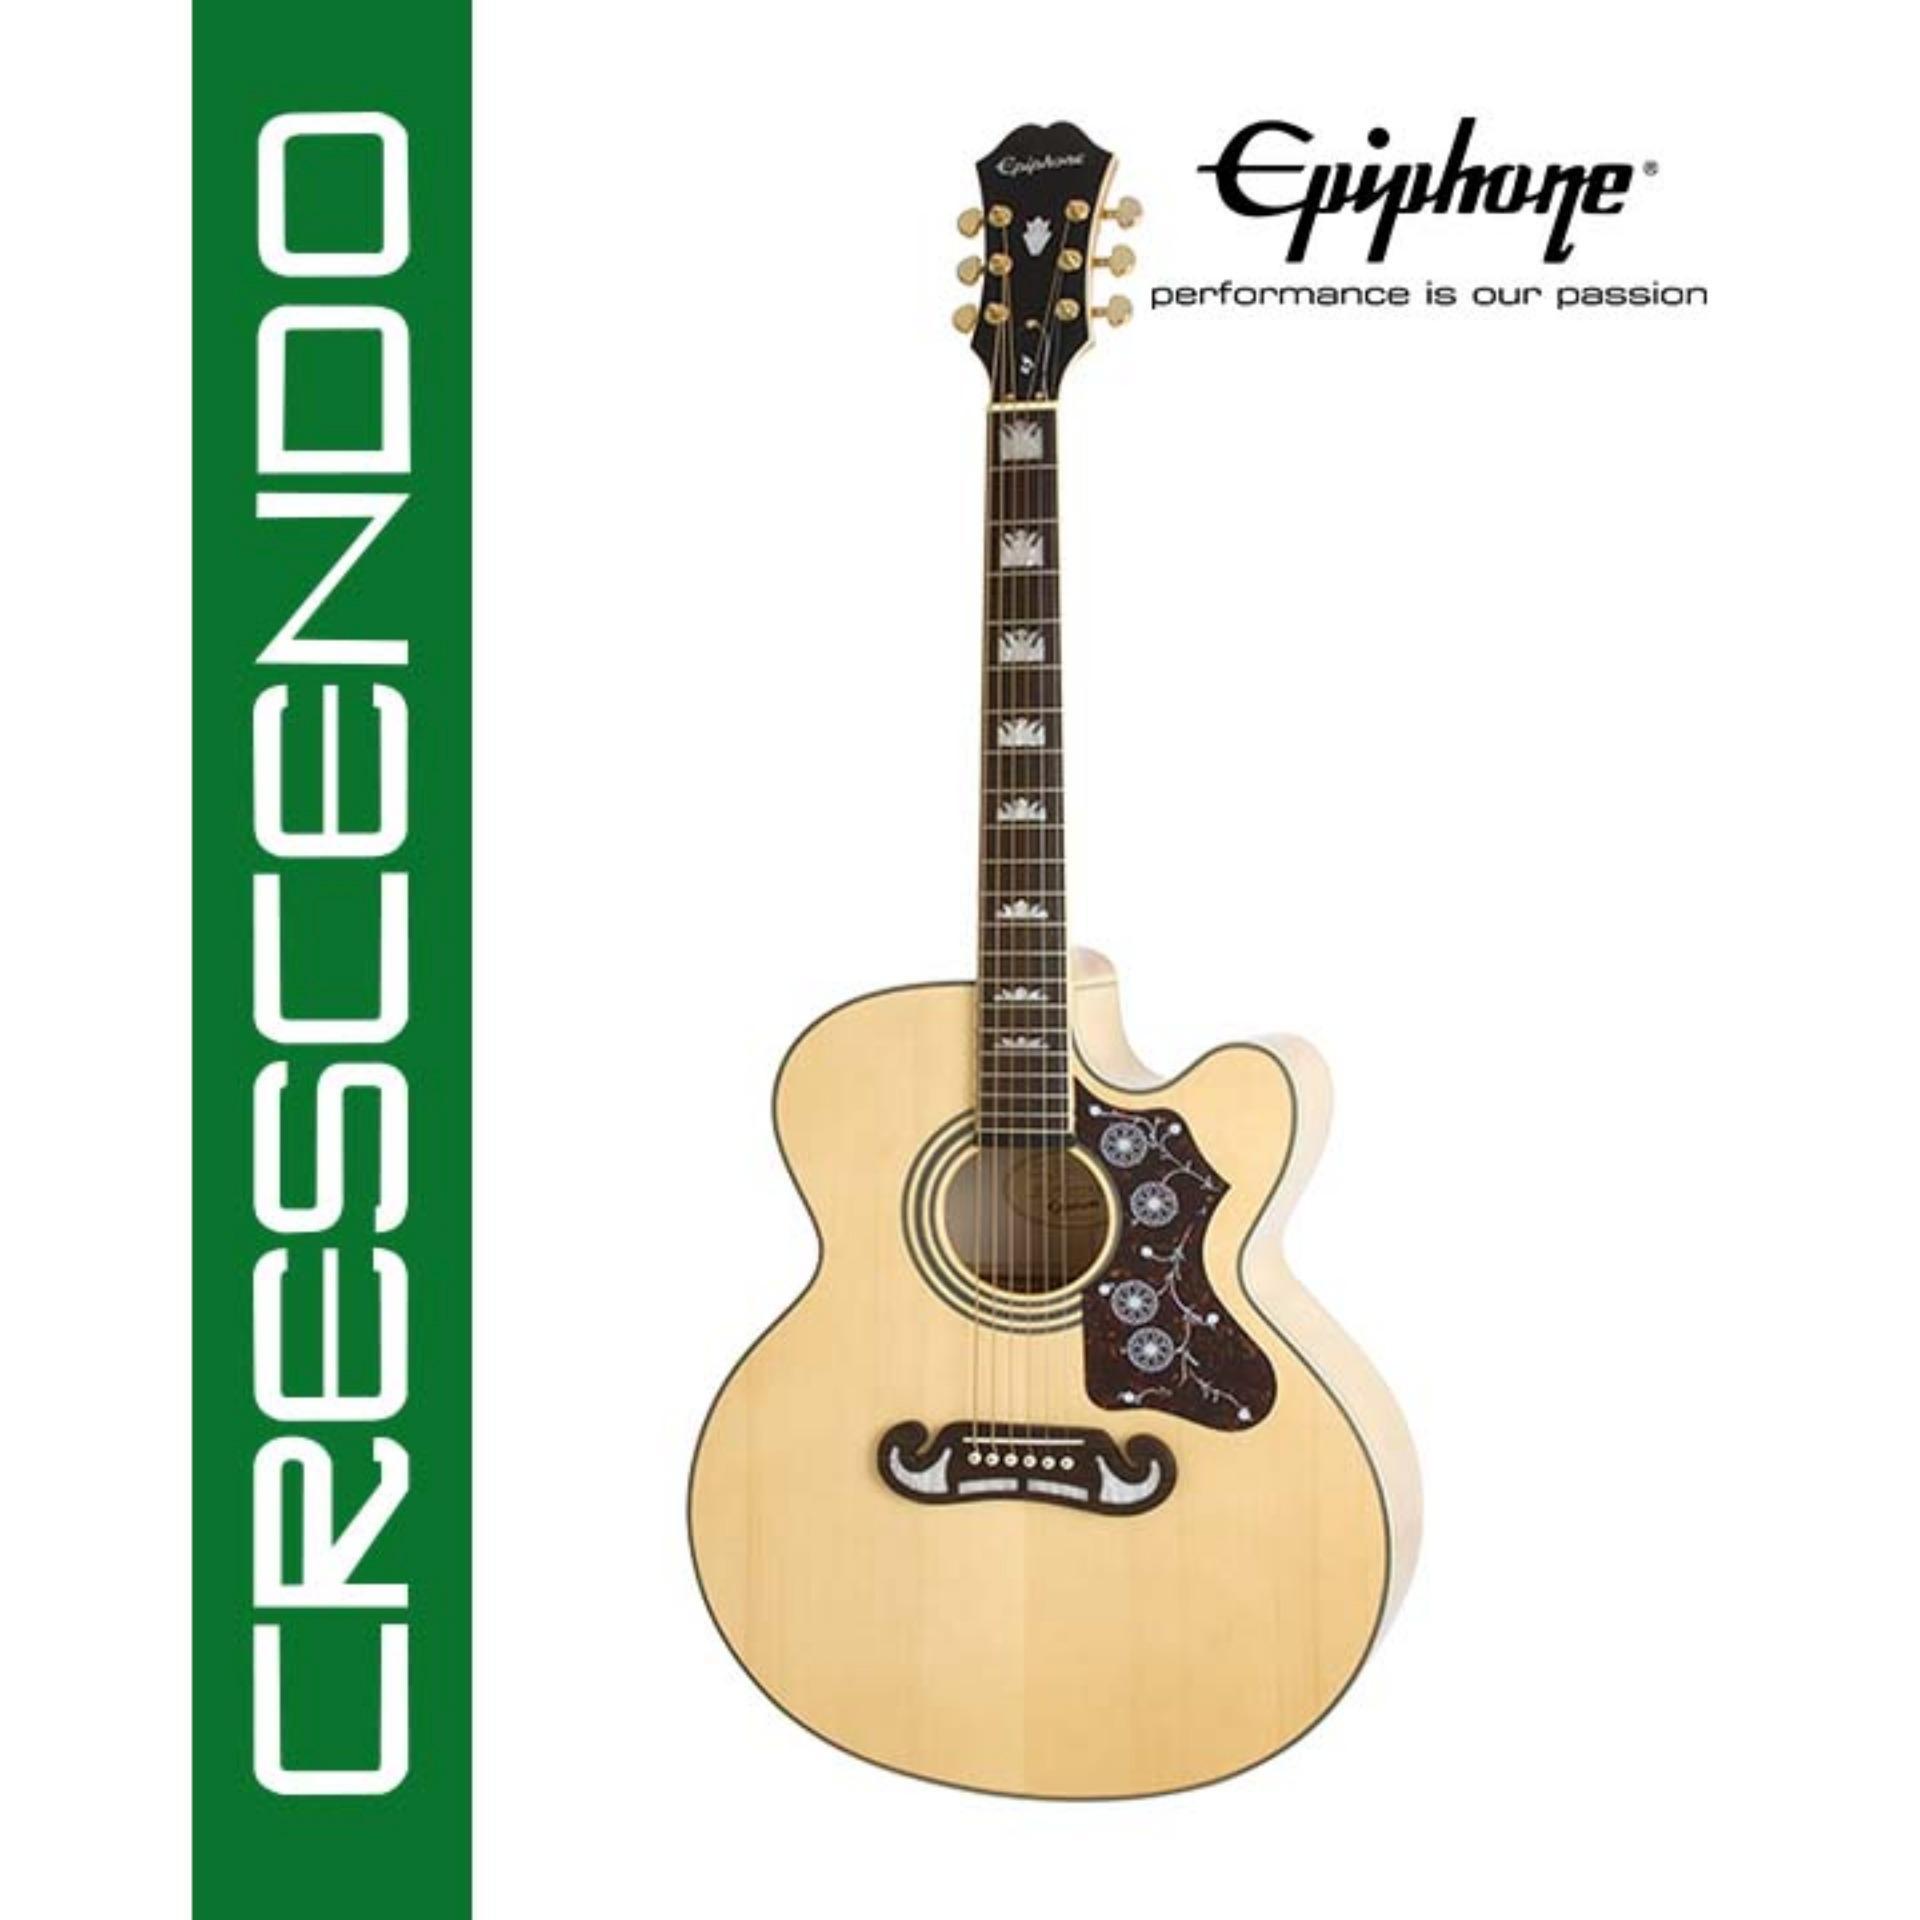 Gitar Yamaha Original Akustik Elektrik Electric Acoustic Cpx 500ii Cort Sfx Me Op 402000734 Cpx500ii Bl Hitam Page